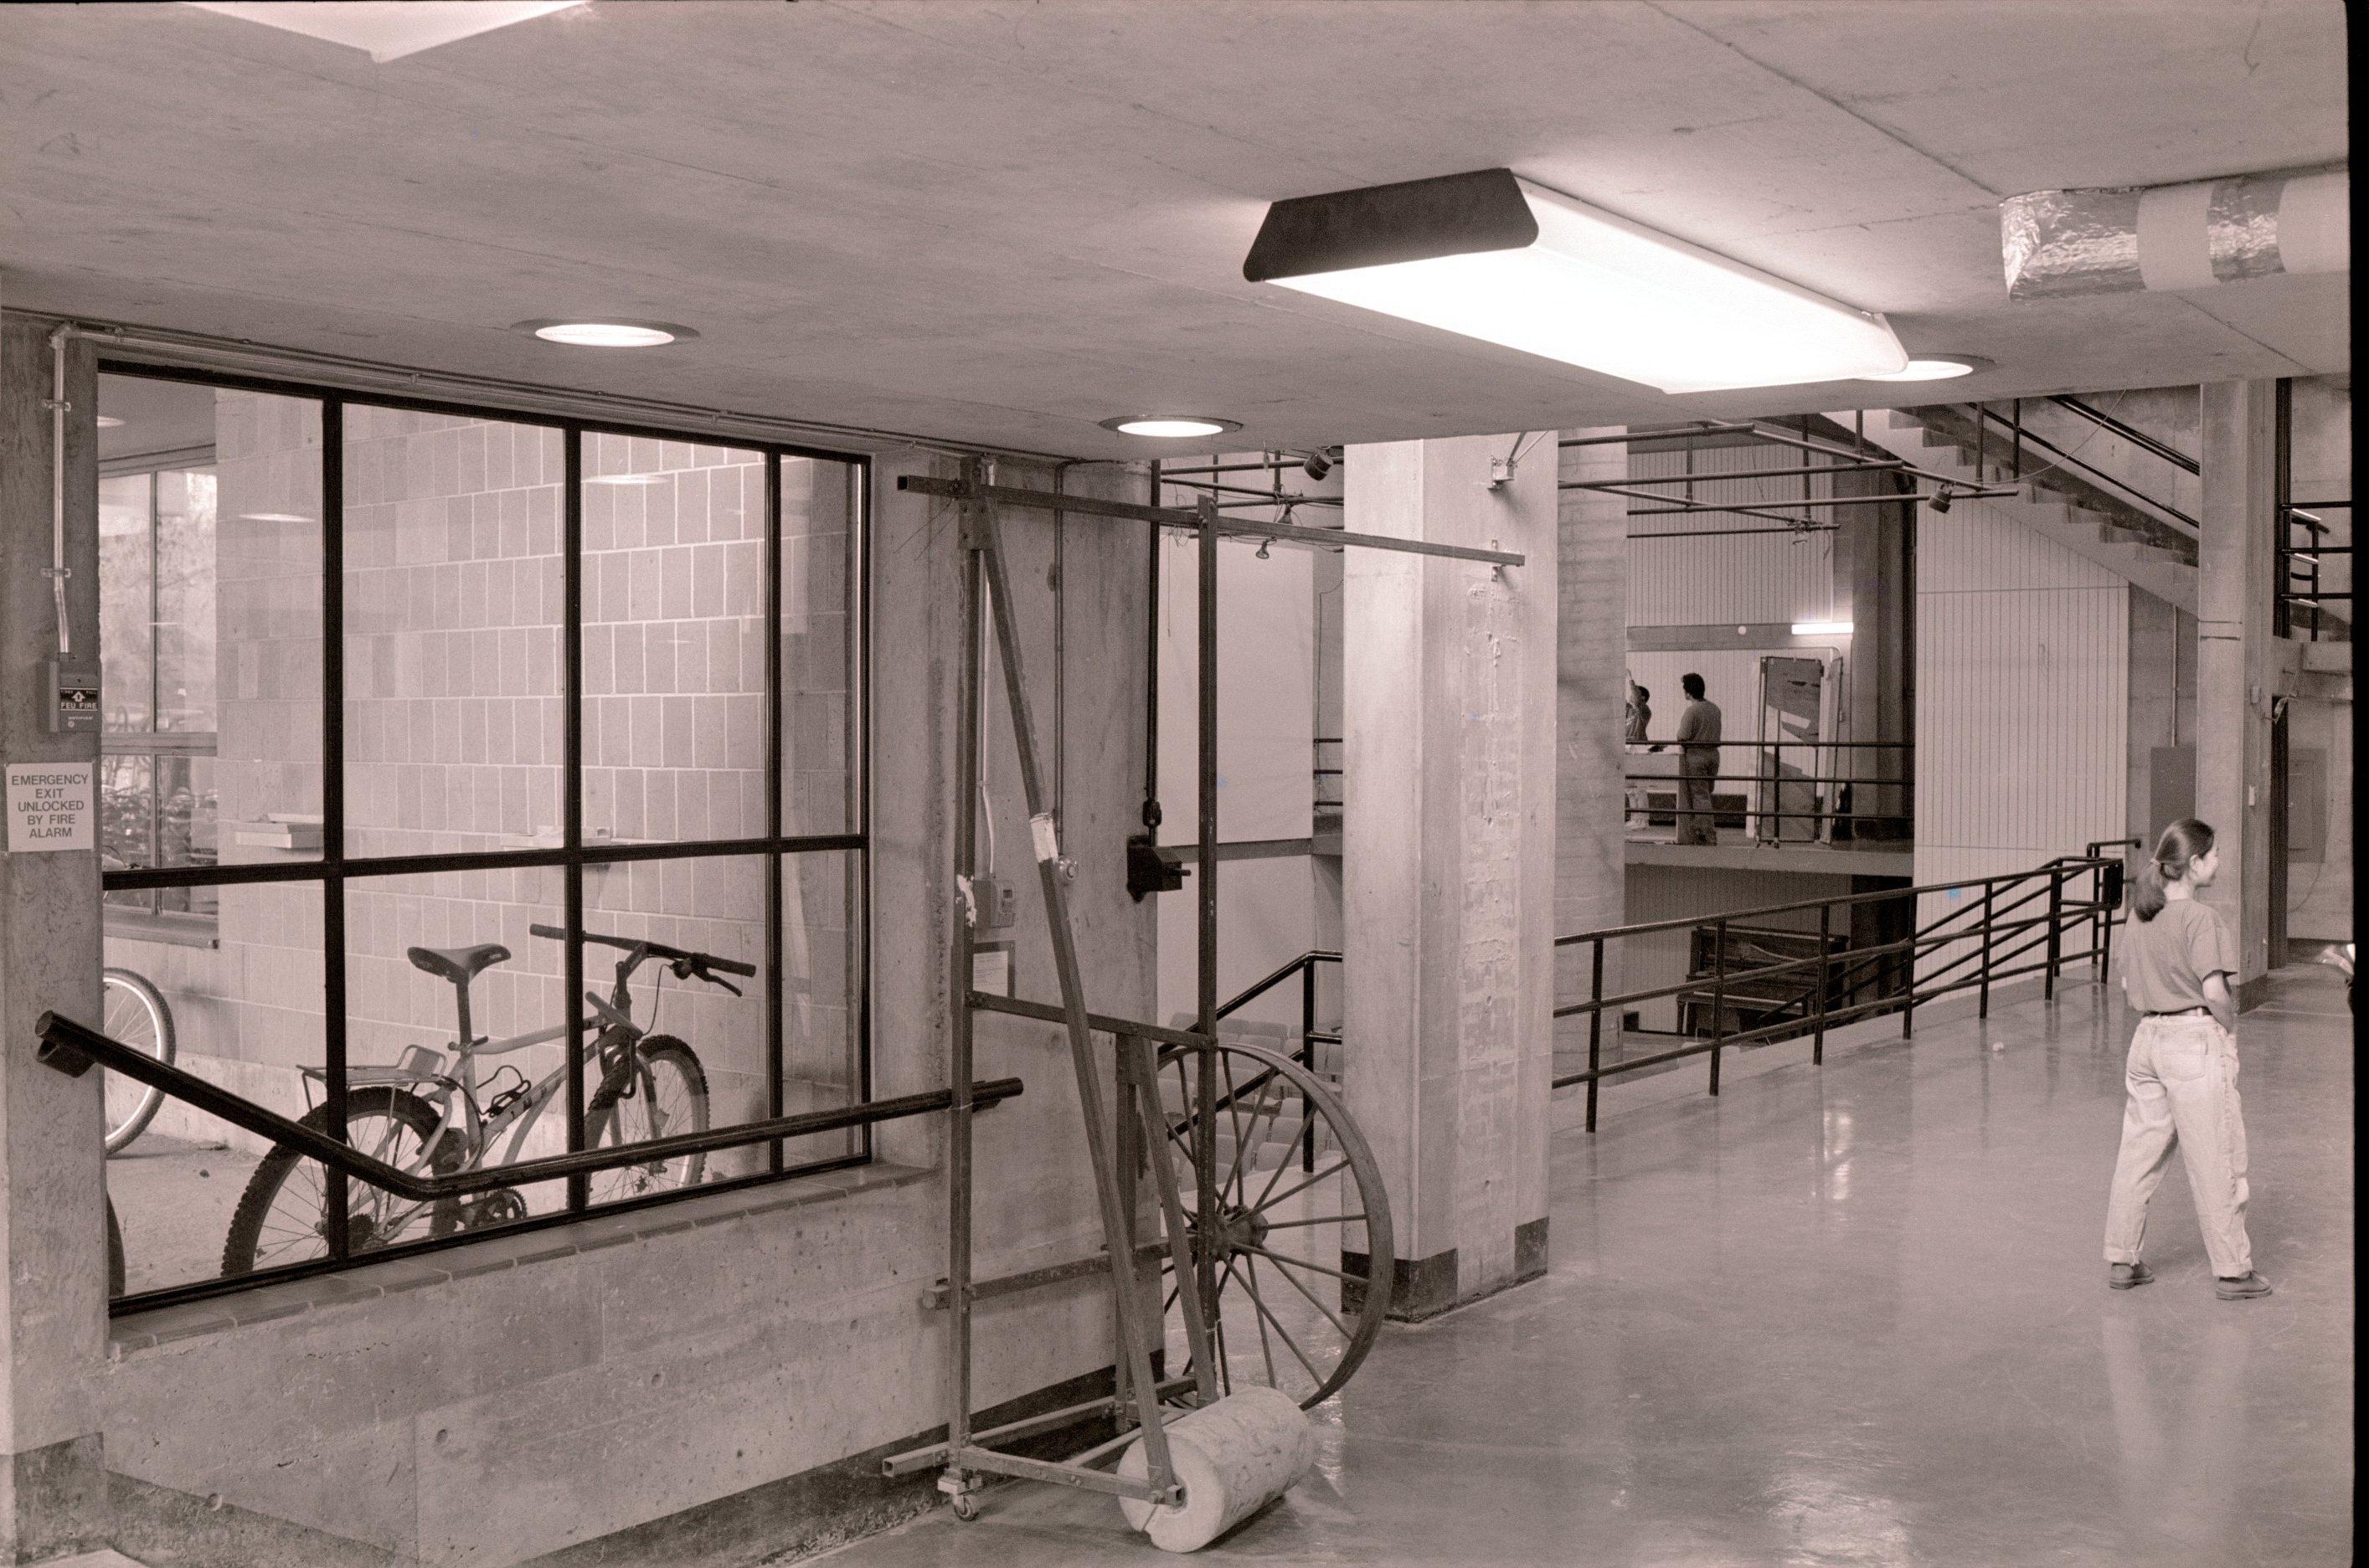 Misc interiors_1990s_-0019